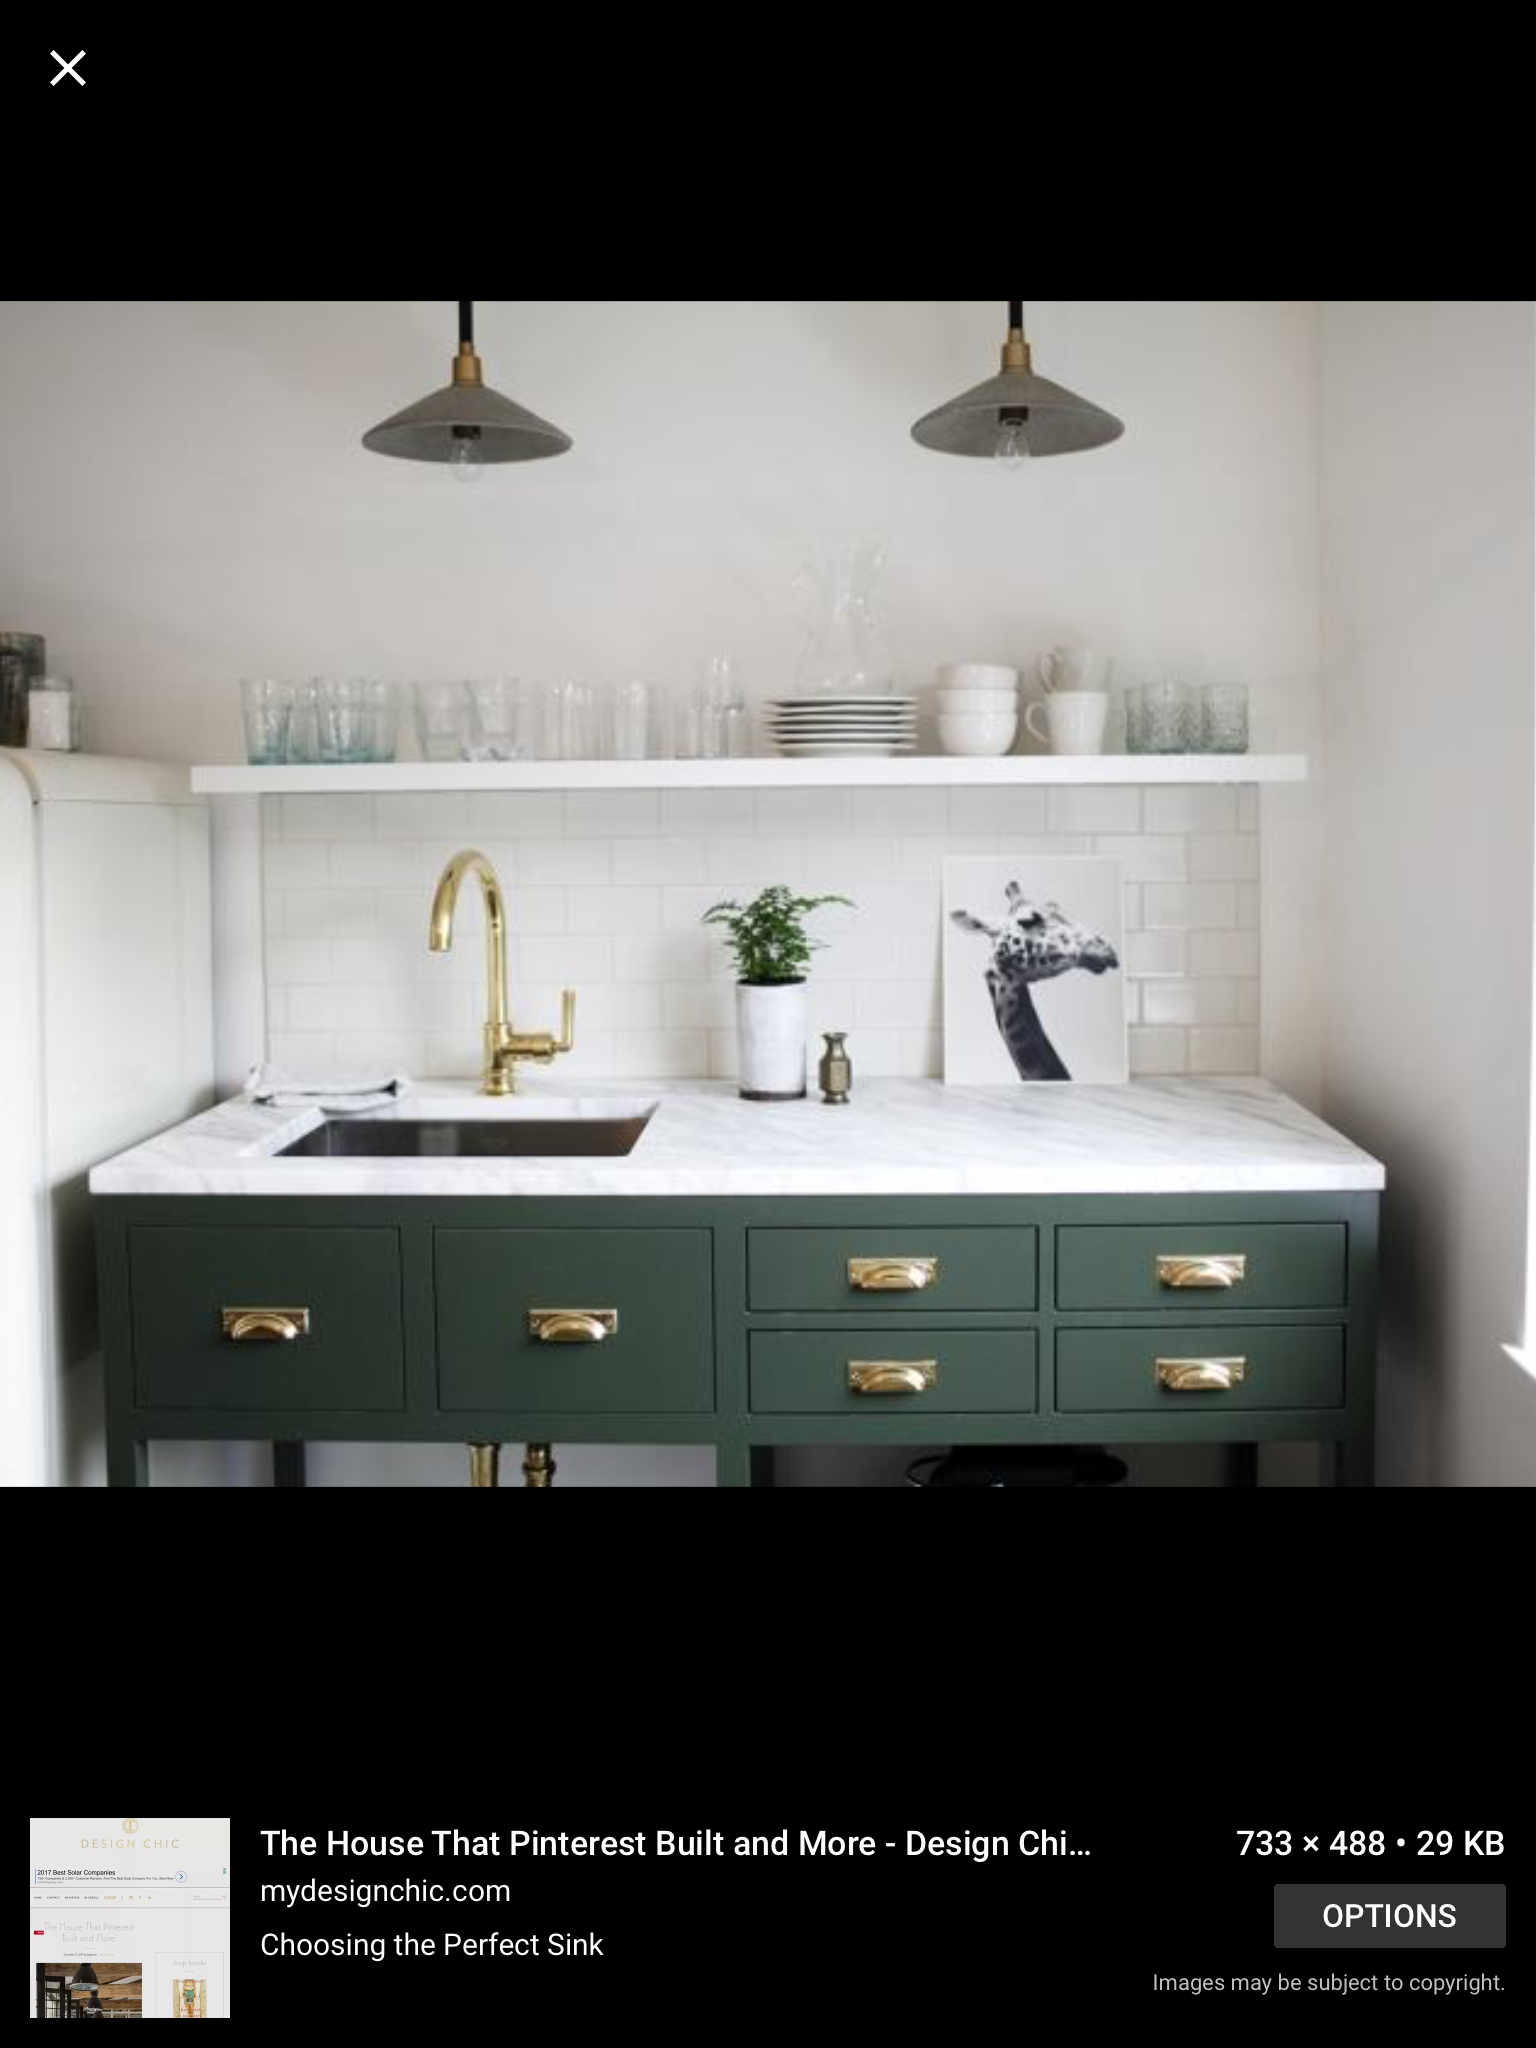 Pin by Kathryn Foley on Kitchens | Refinish kitchen ...